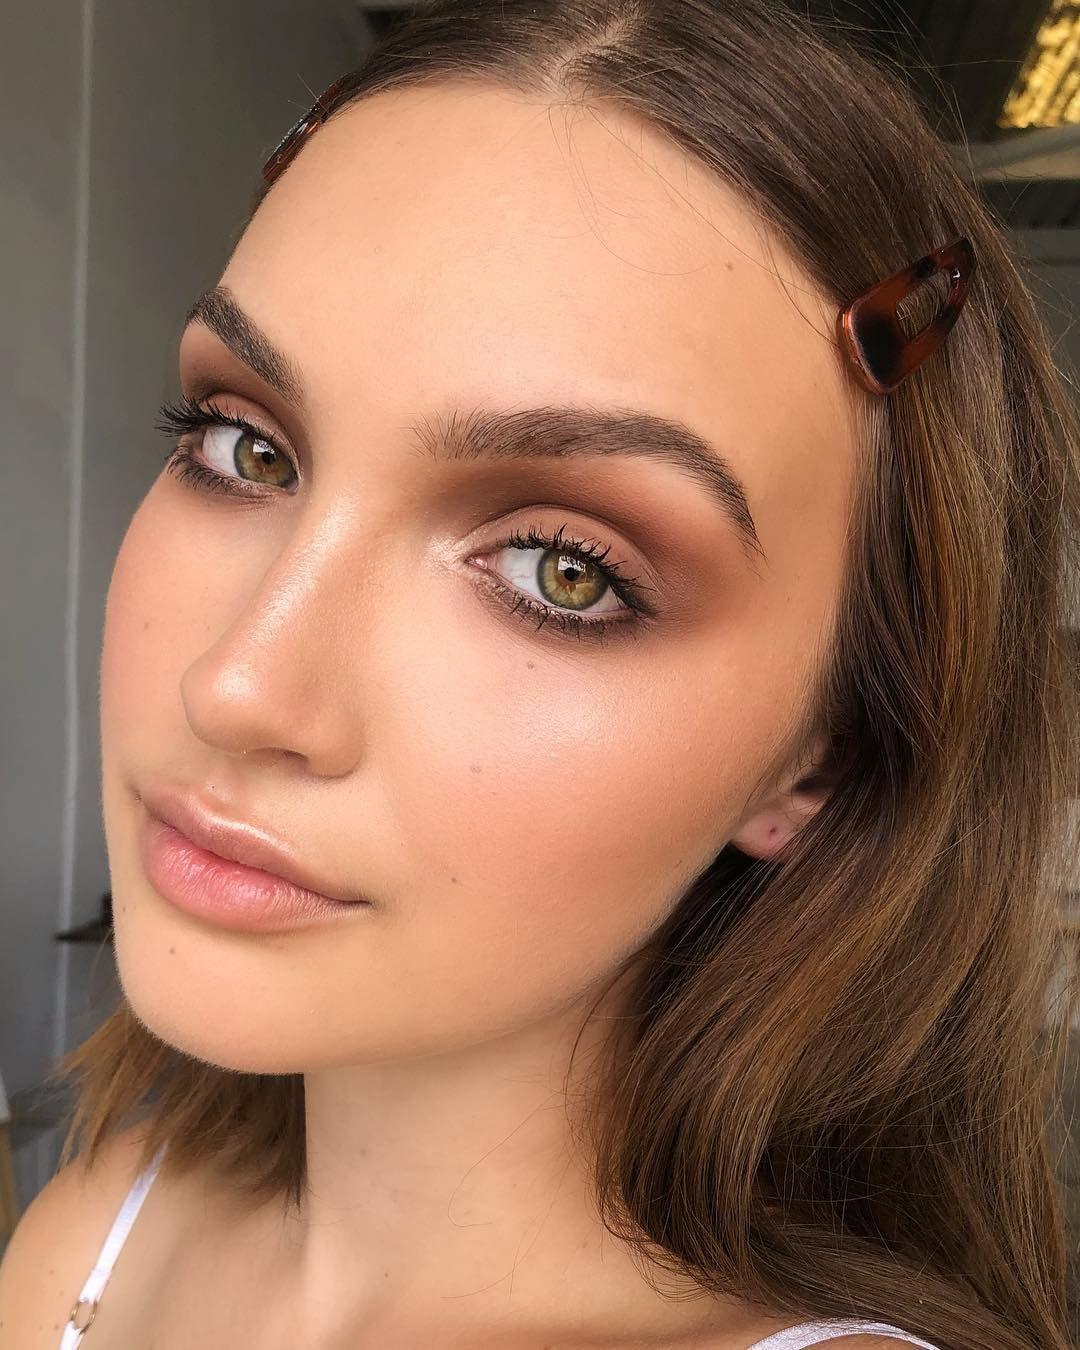 "TANIELLE JAI Makeup Artist on Instagram: ""This cutie!!! @jasminegeex shooting with @brookie_davies Eyeshadows using @viseart nuetral matte palette @lauramercier radiance primer,…"""